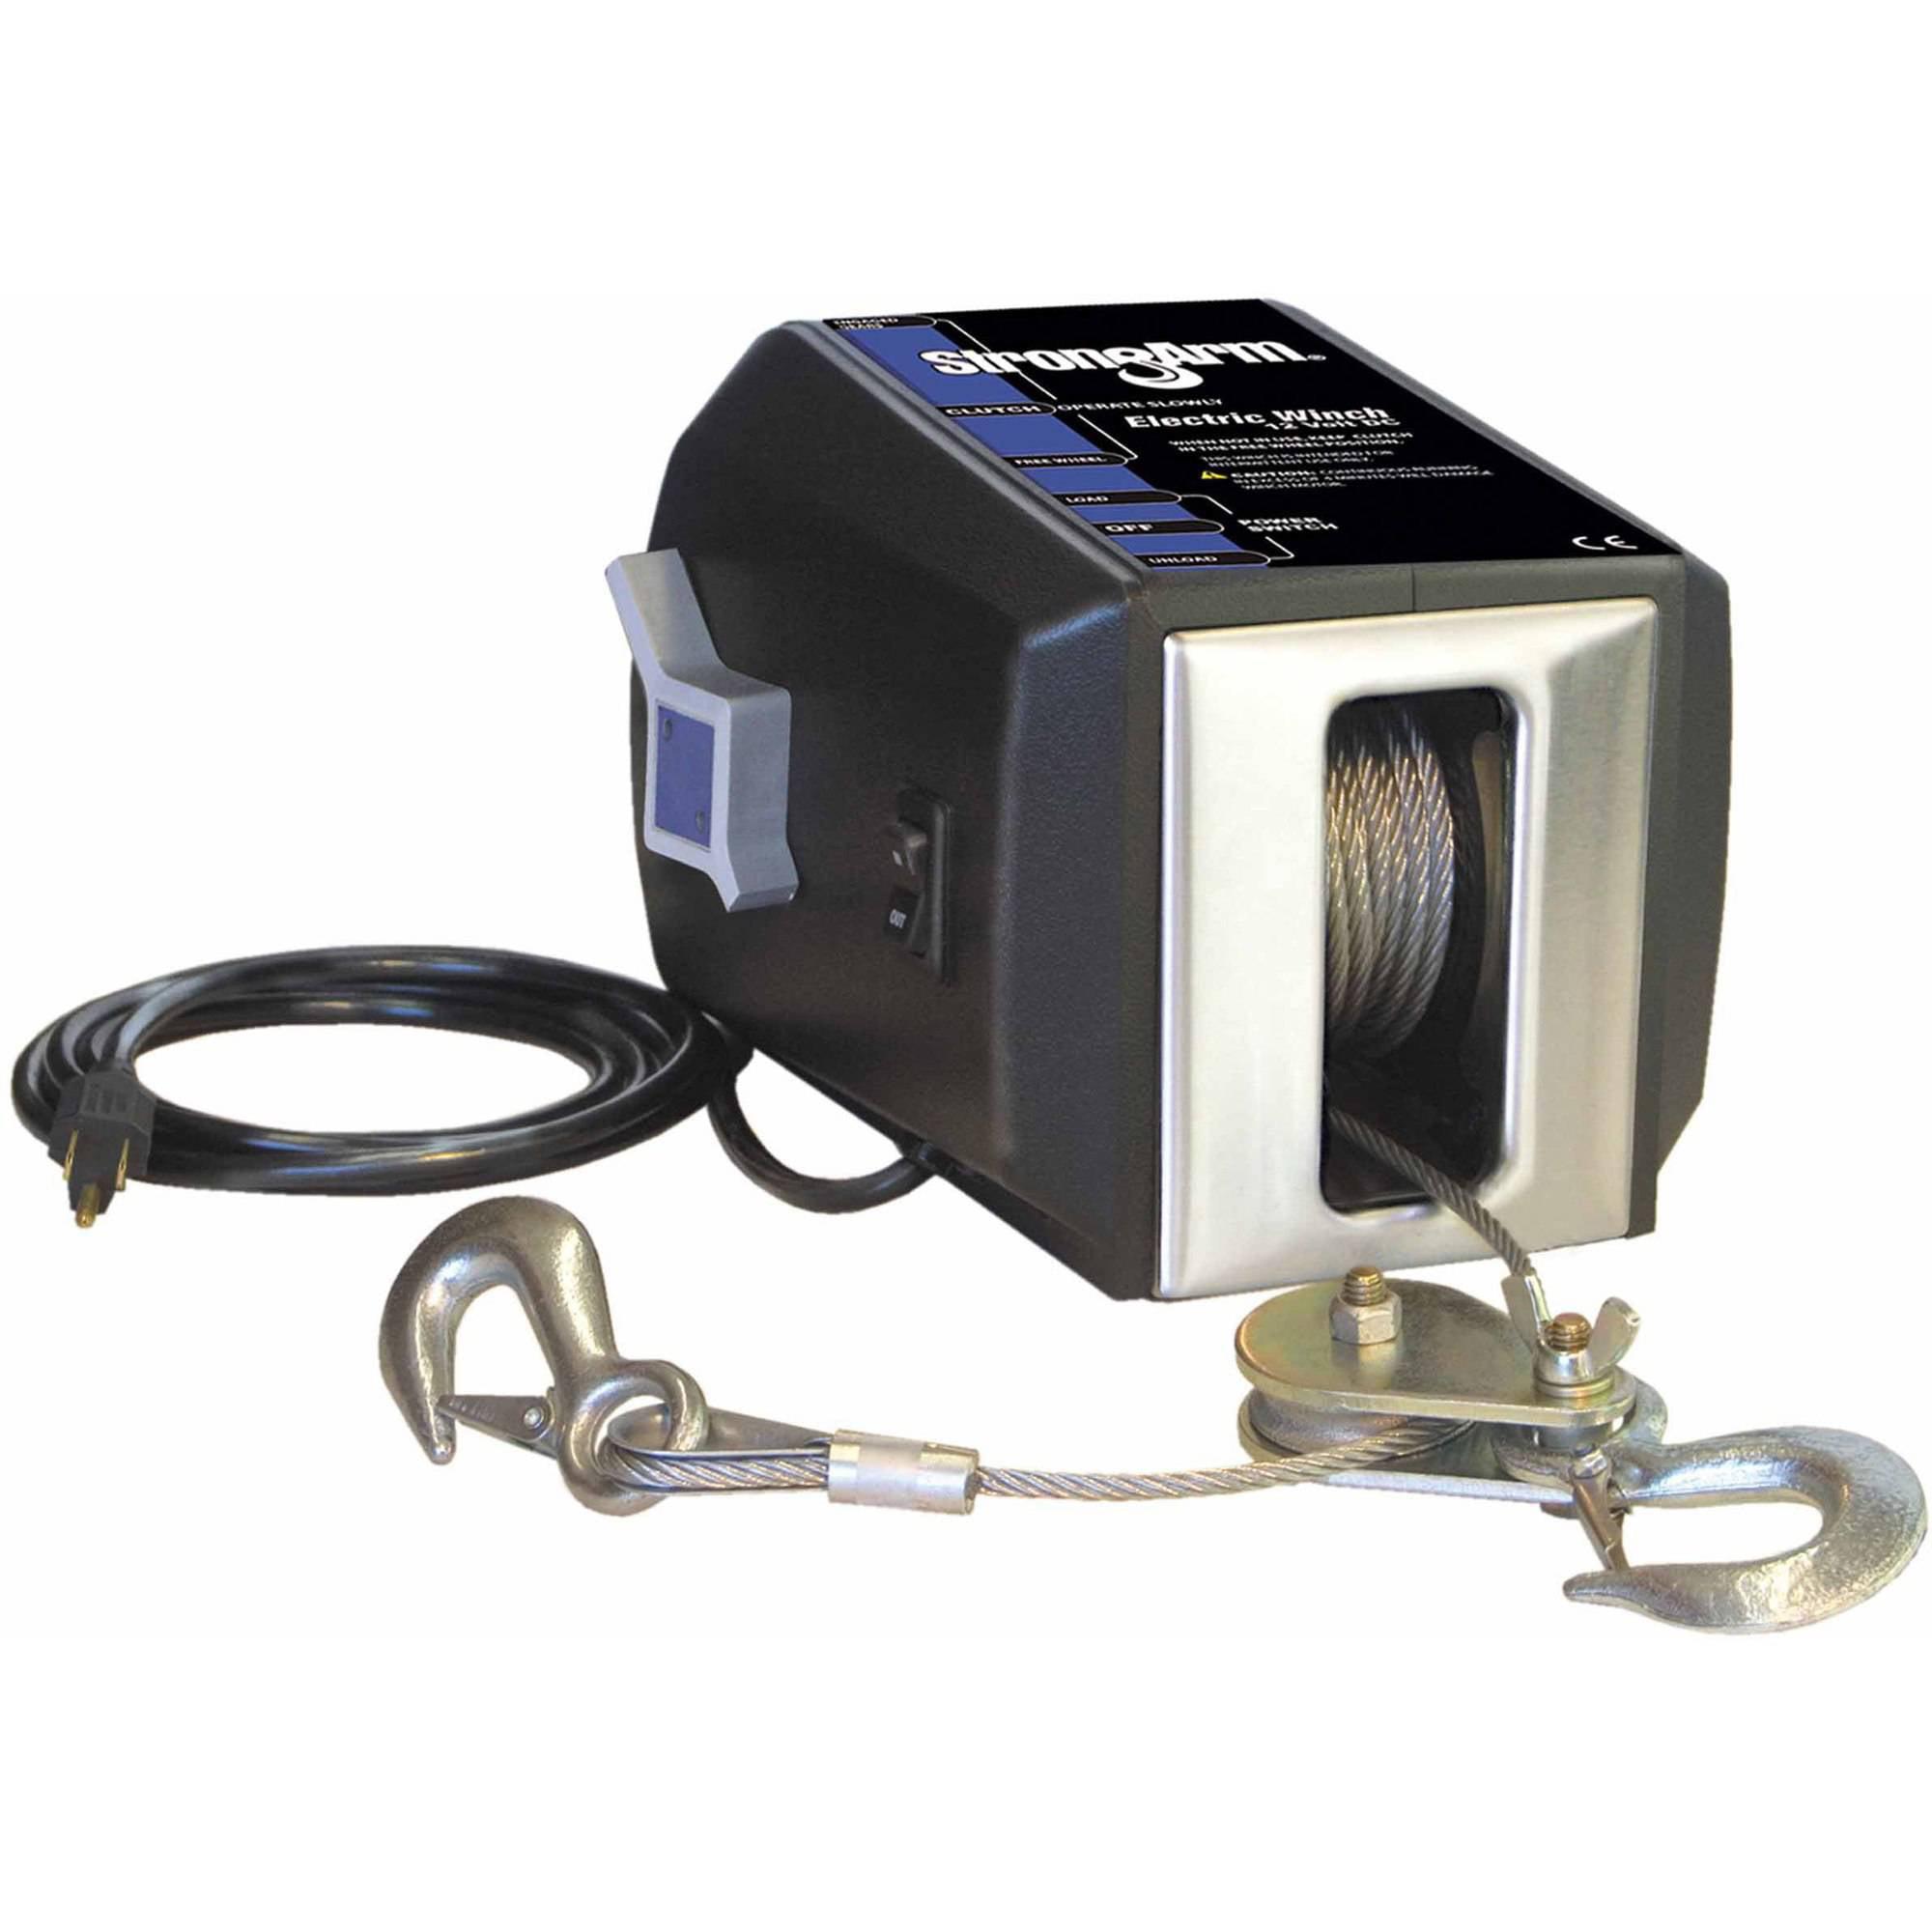 Dutton-Lainson 24876 StrongArm SA Series Electric Winch, 120V, 4000 lb